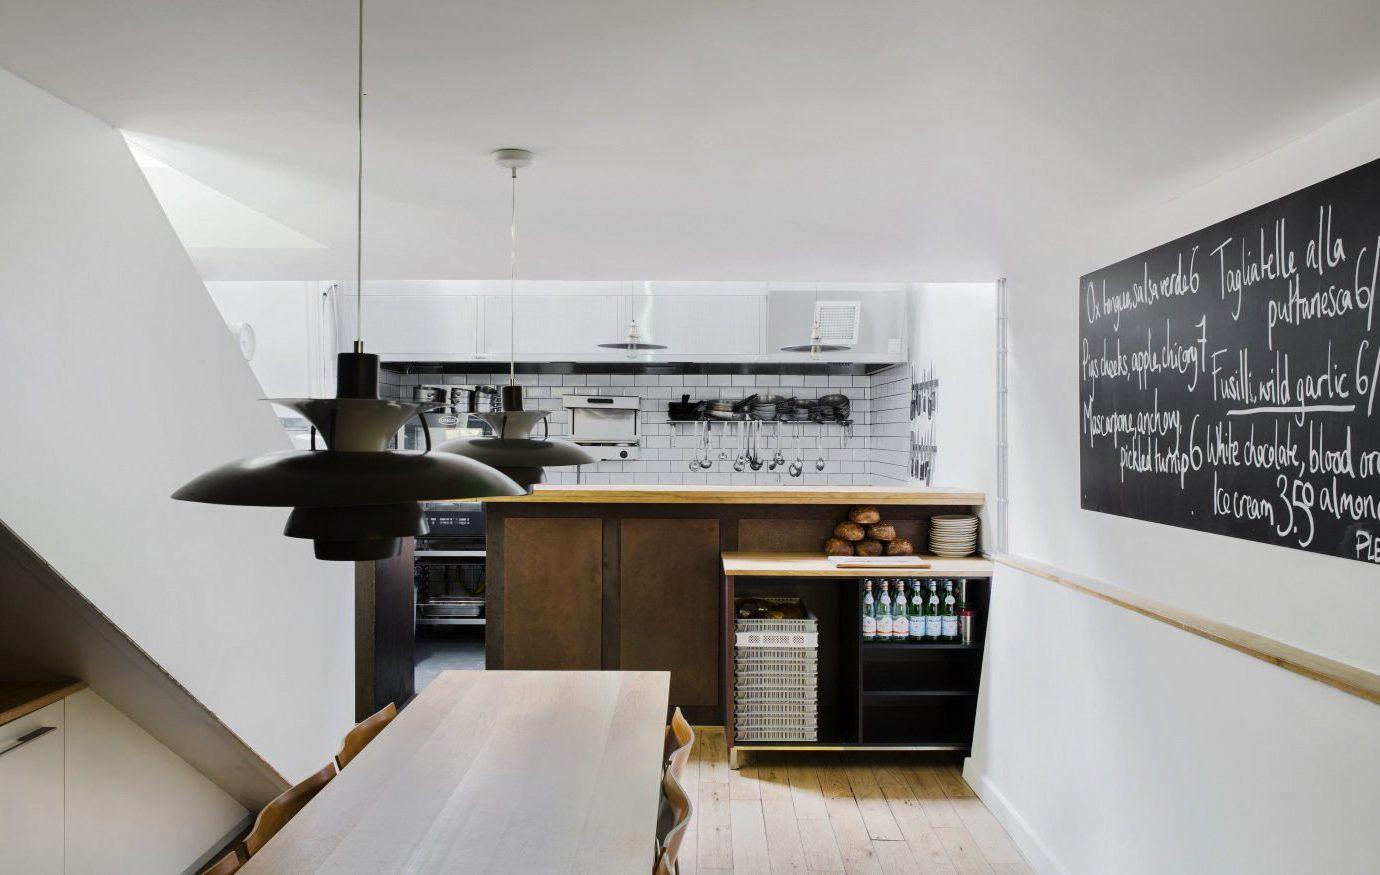 Offbeat Trip Ideas indoor wall Kitchen interior design countertop product design loft interior designer apartment